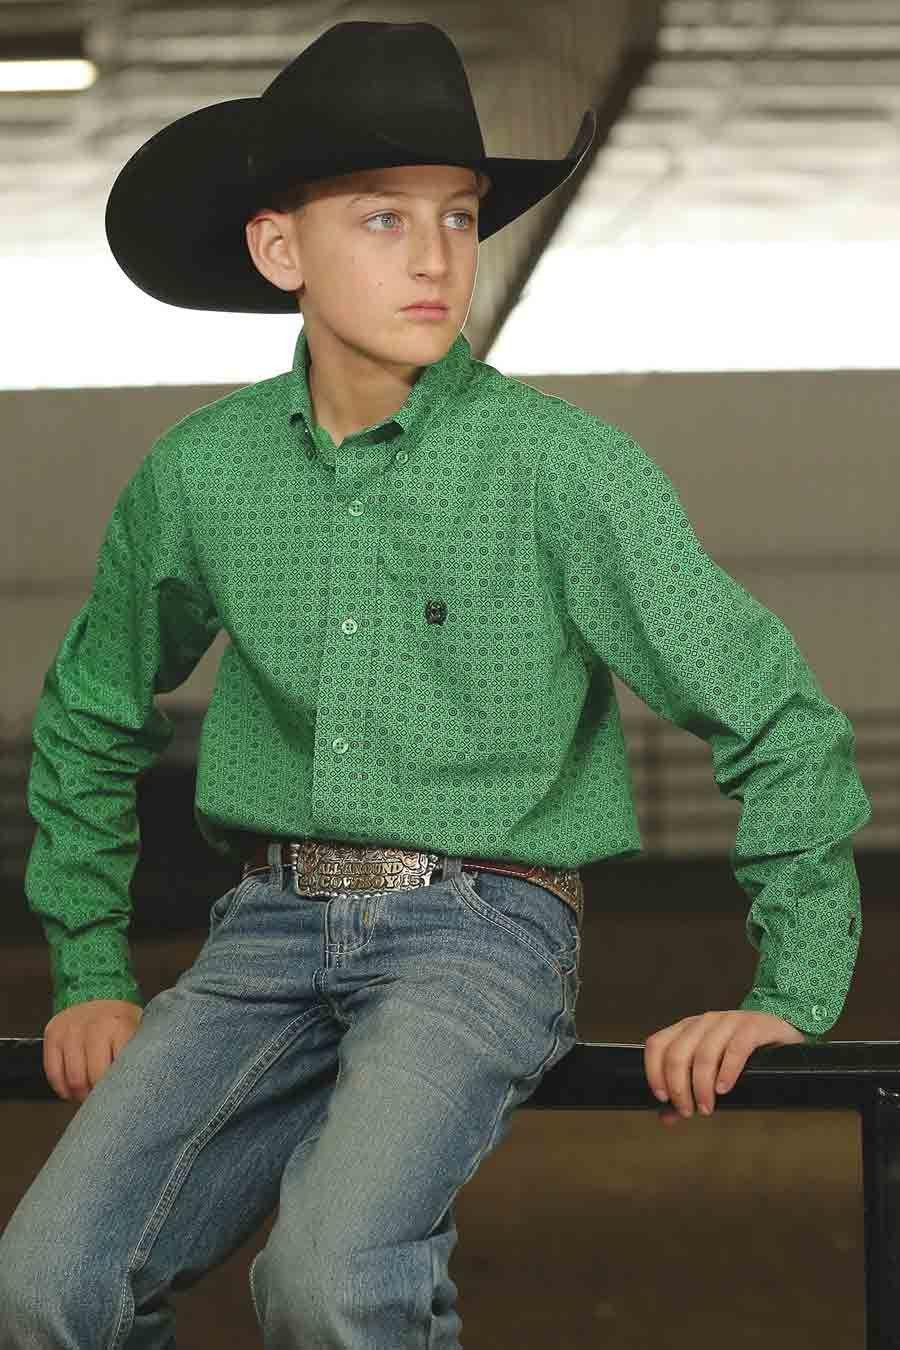 4910ca584cc Cinch Boys/Toddler/Infant Green Button Down Long Sleeve Shirt in ...